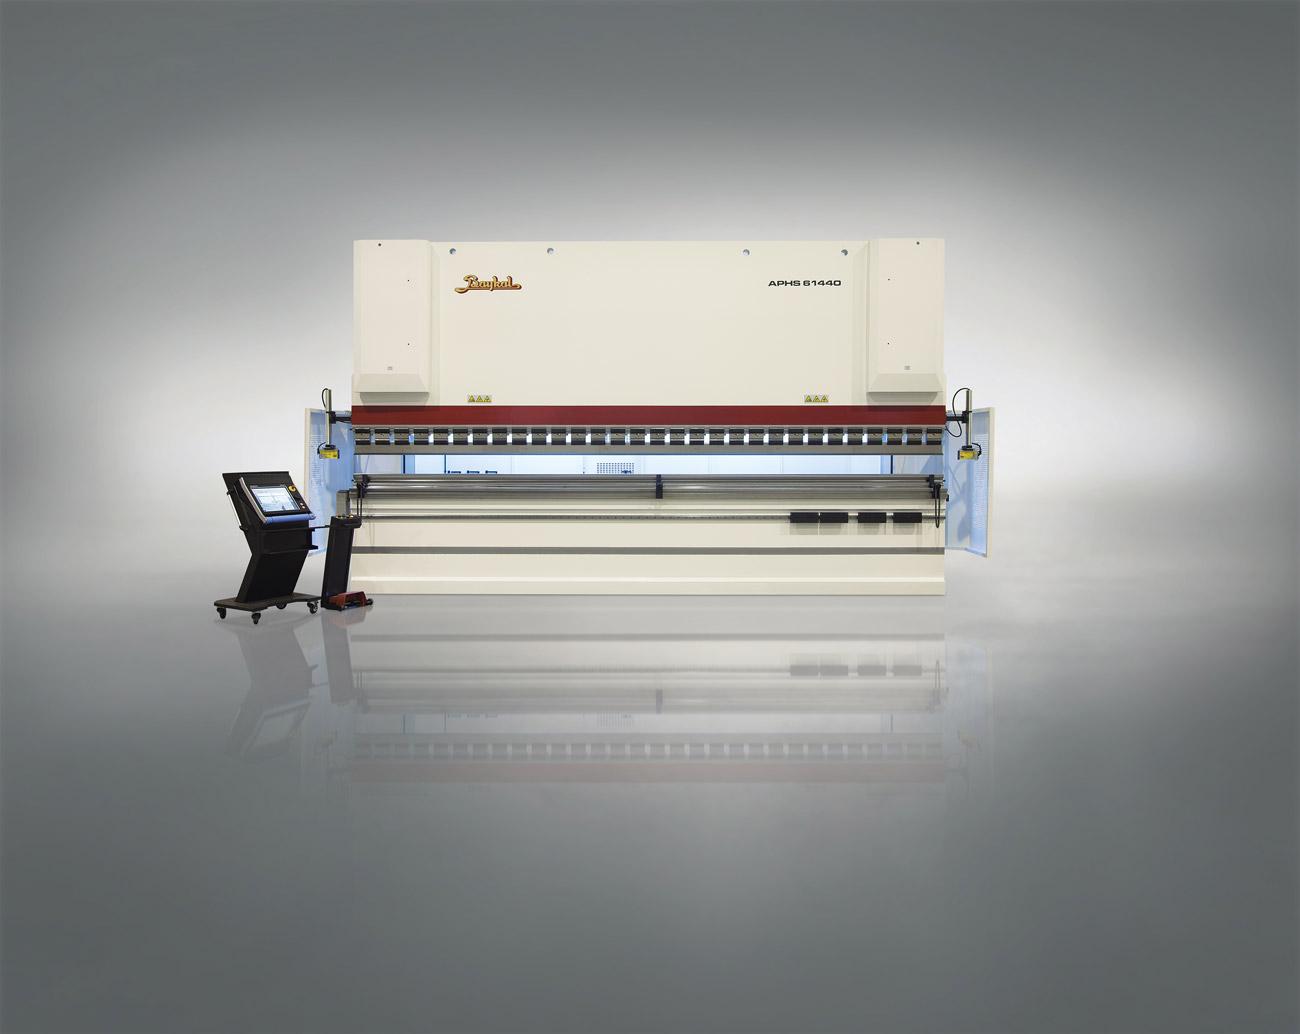 Apkant preša Baykal APHS 61440 CNC, Delem DA-66T